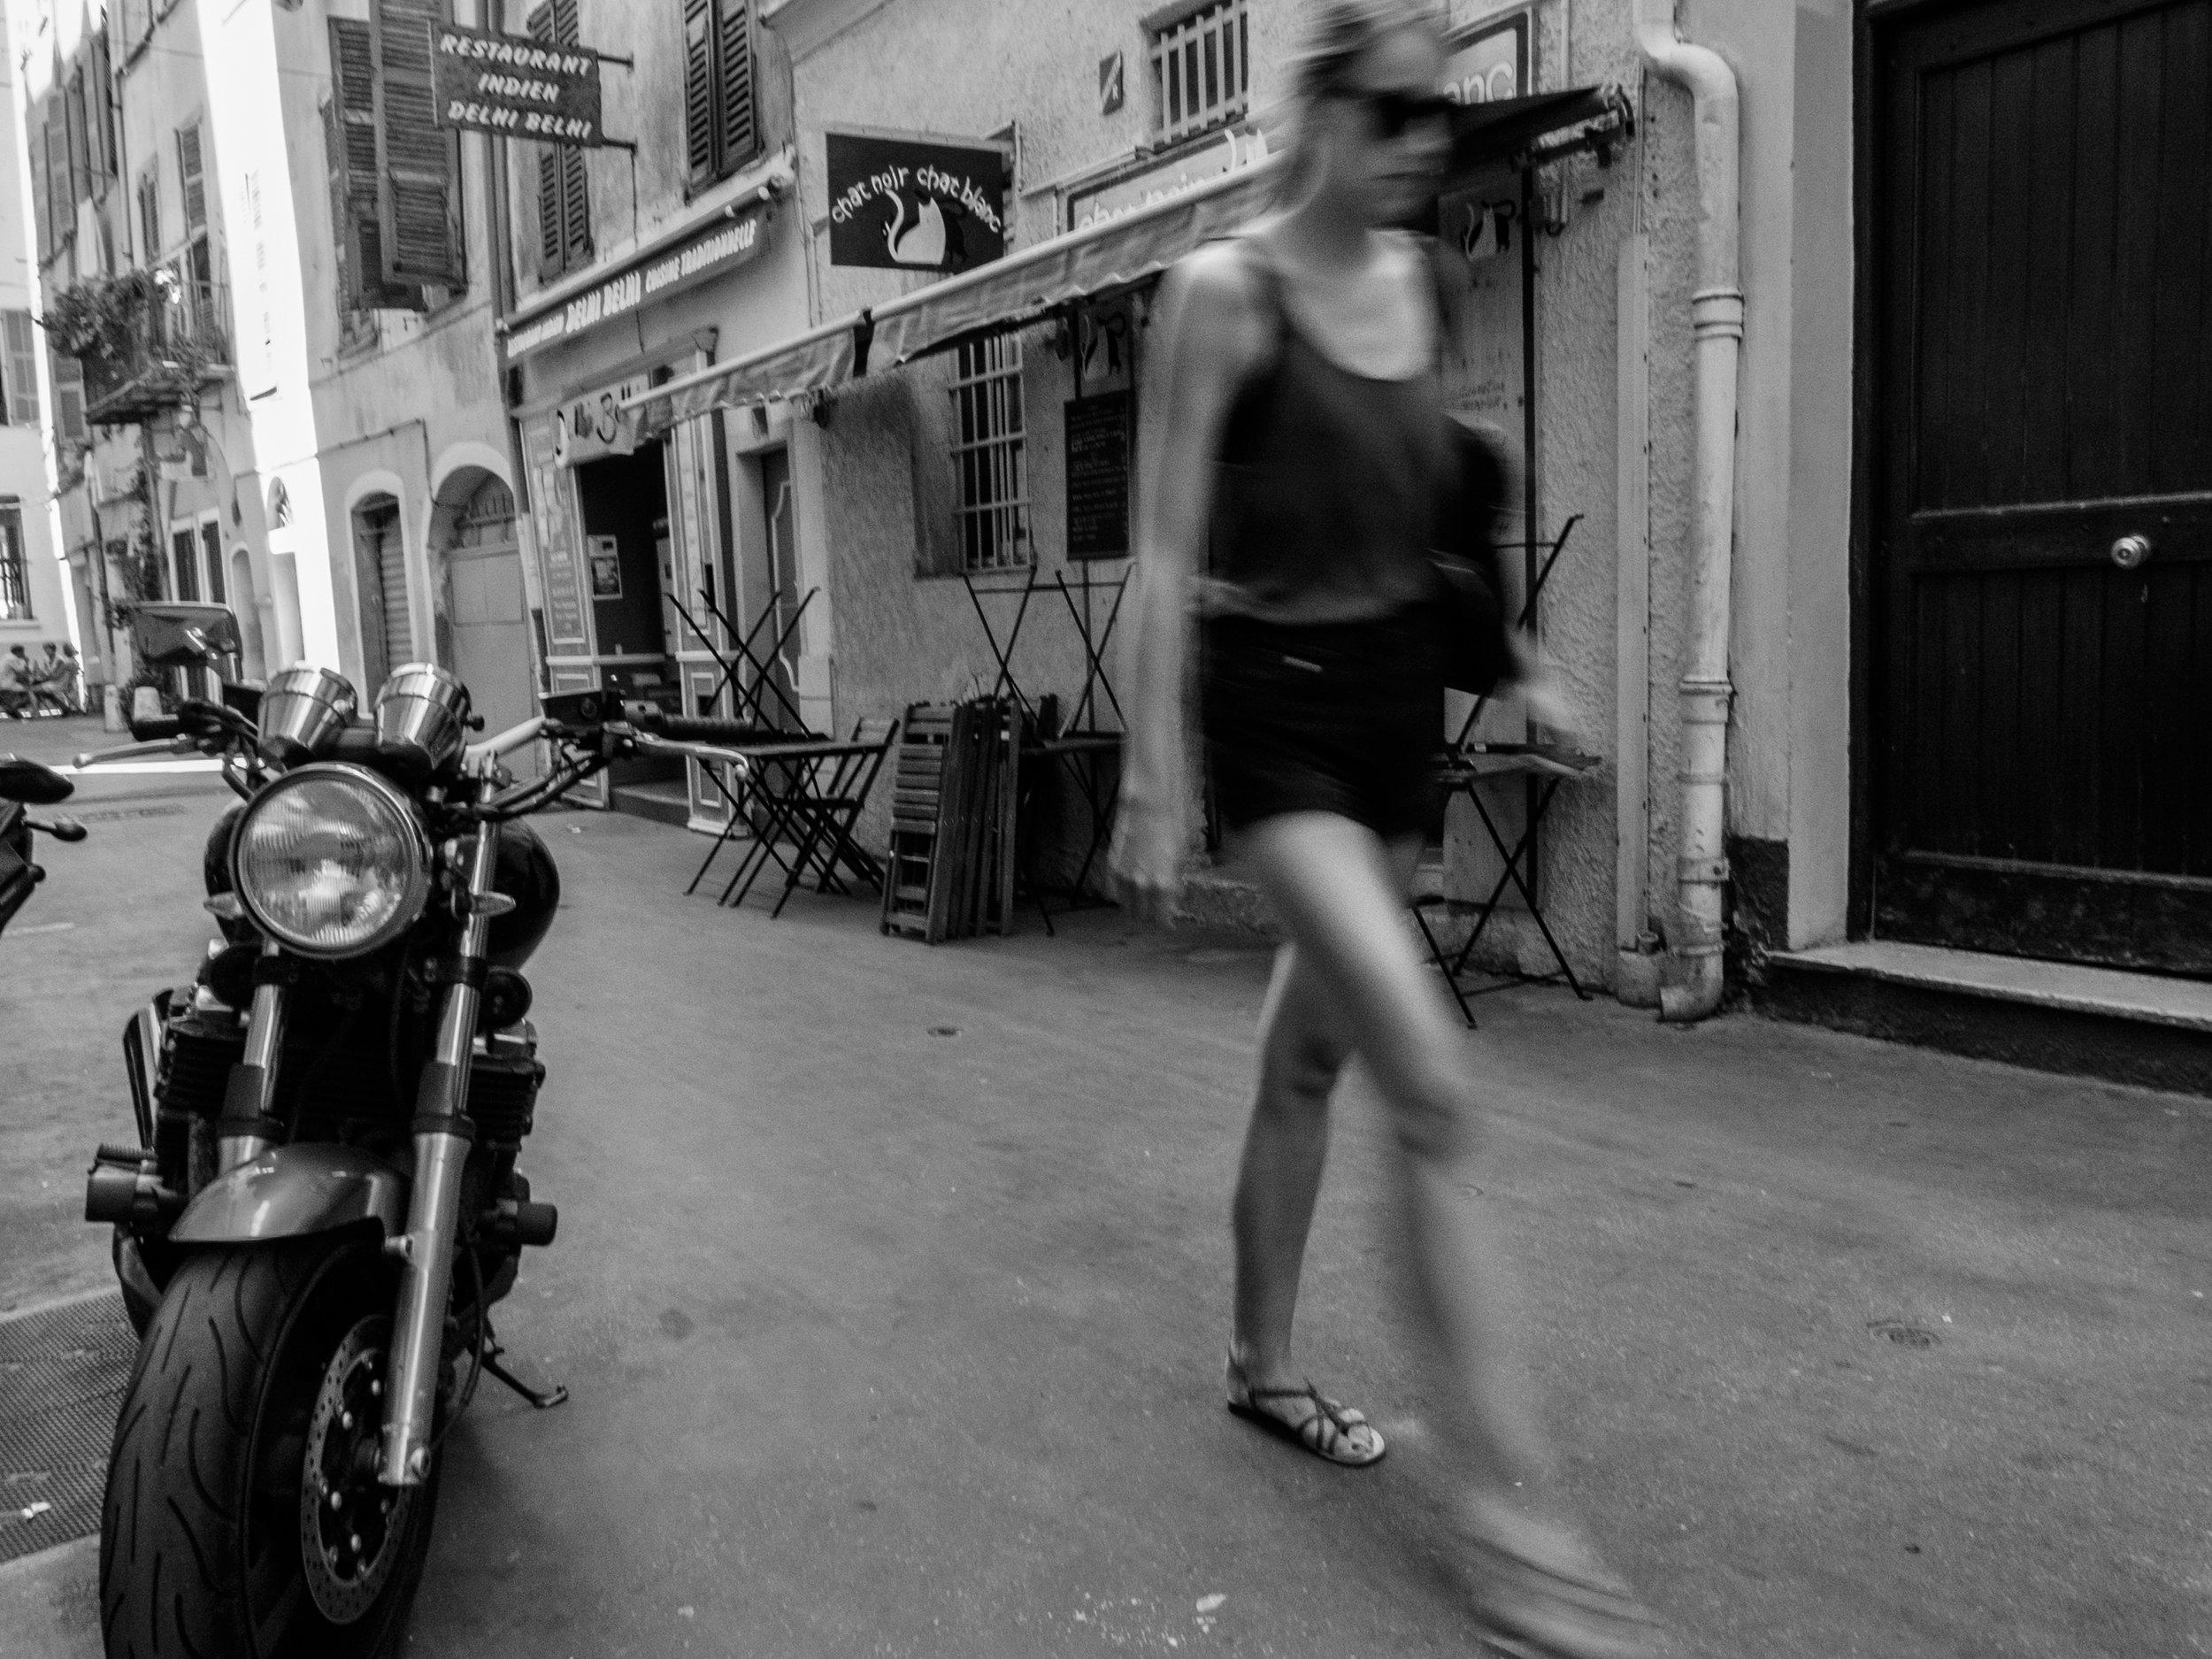 France_Book_1_Nice_11.jpg